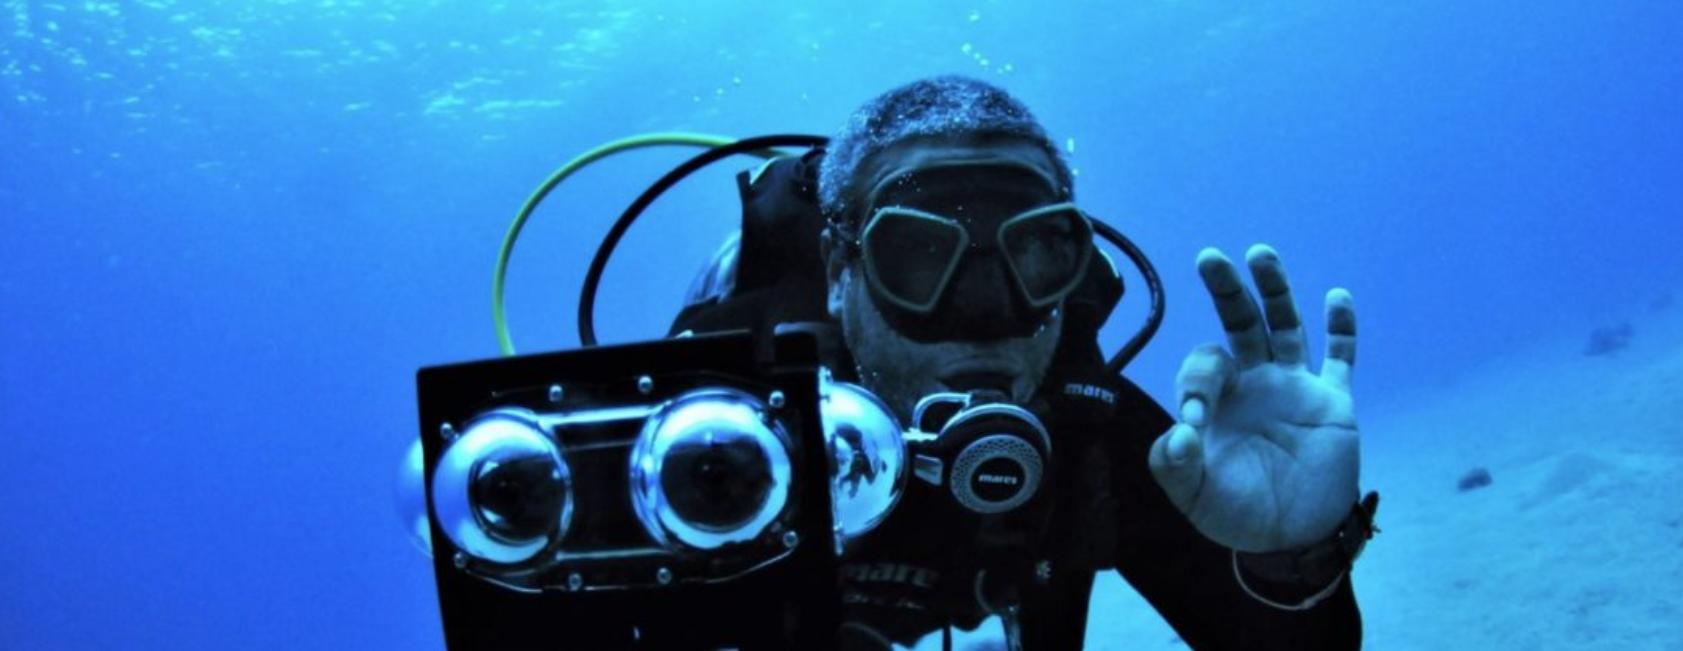 HumanEyes Reveal New Underwater Case For Vuze VR Cameras